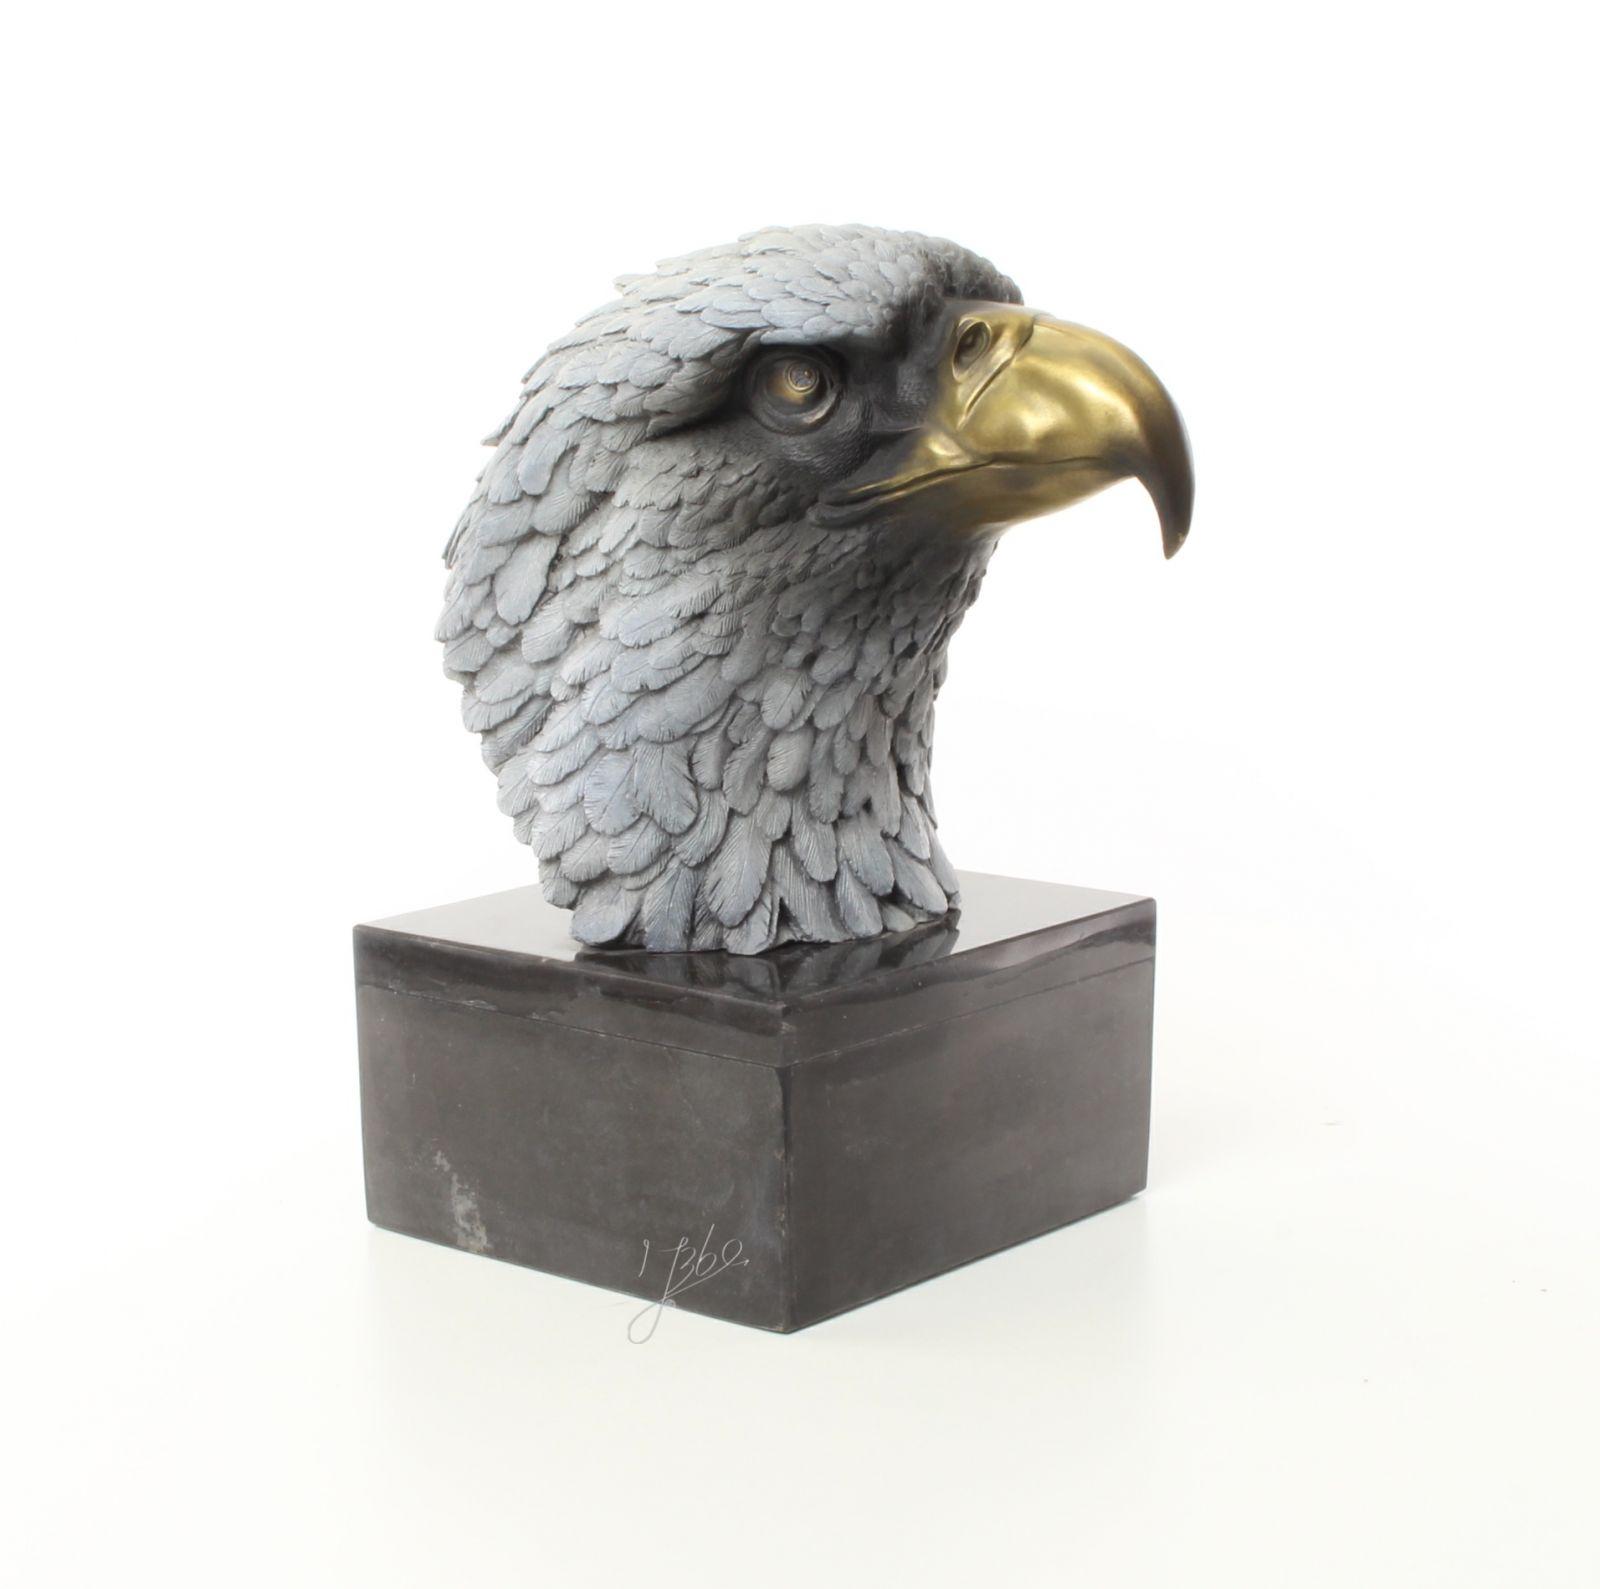 Eagle head made of bronze BrokInCZ